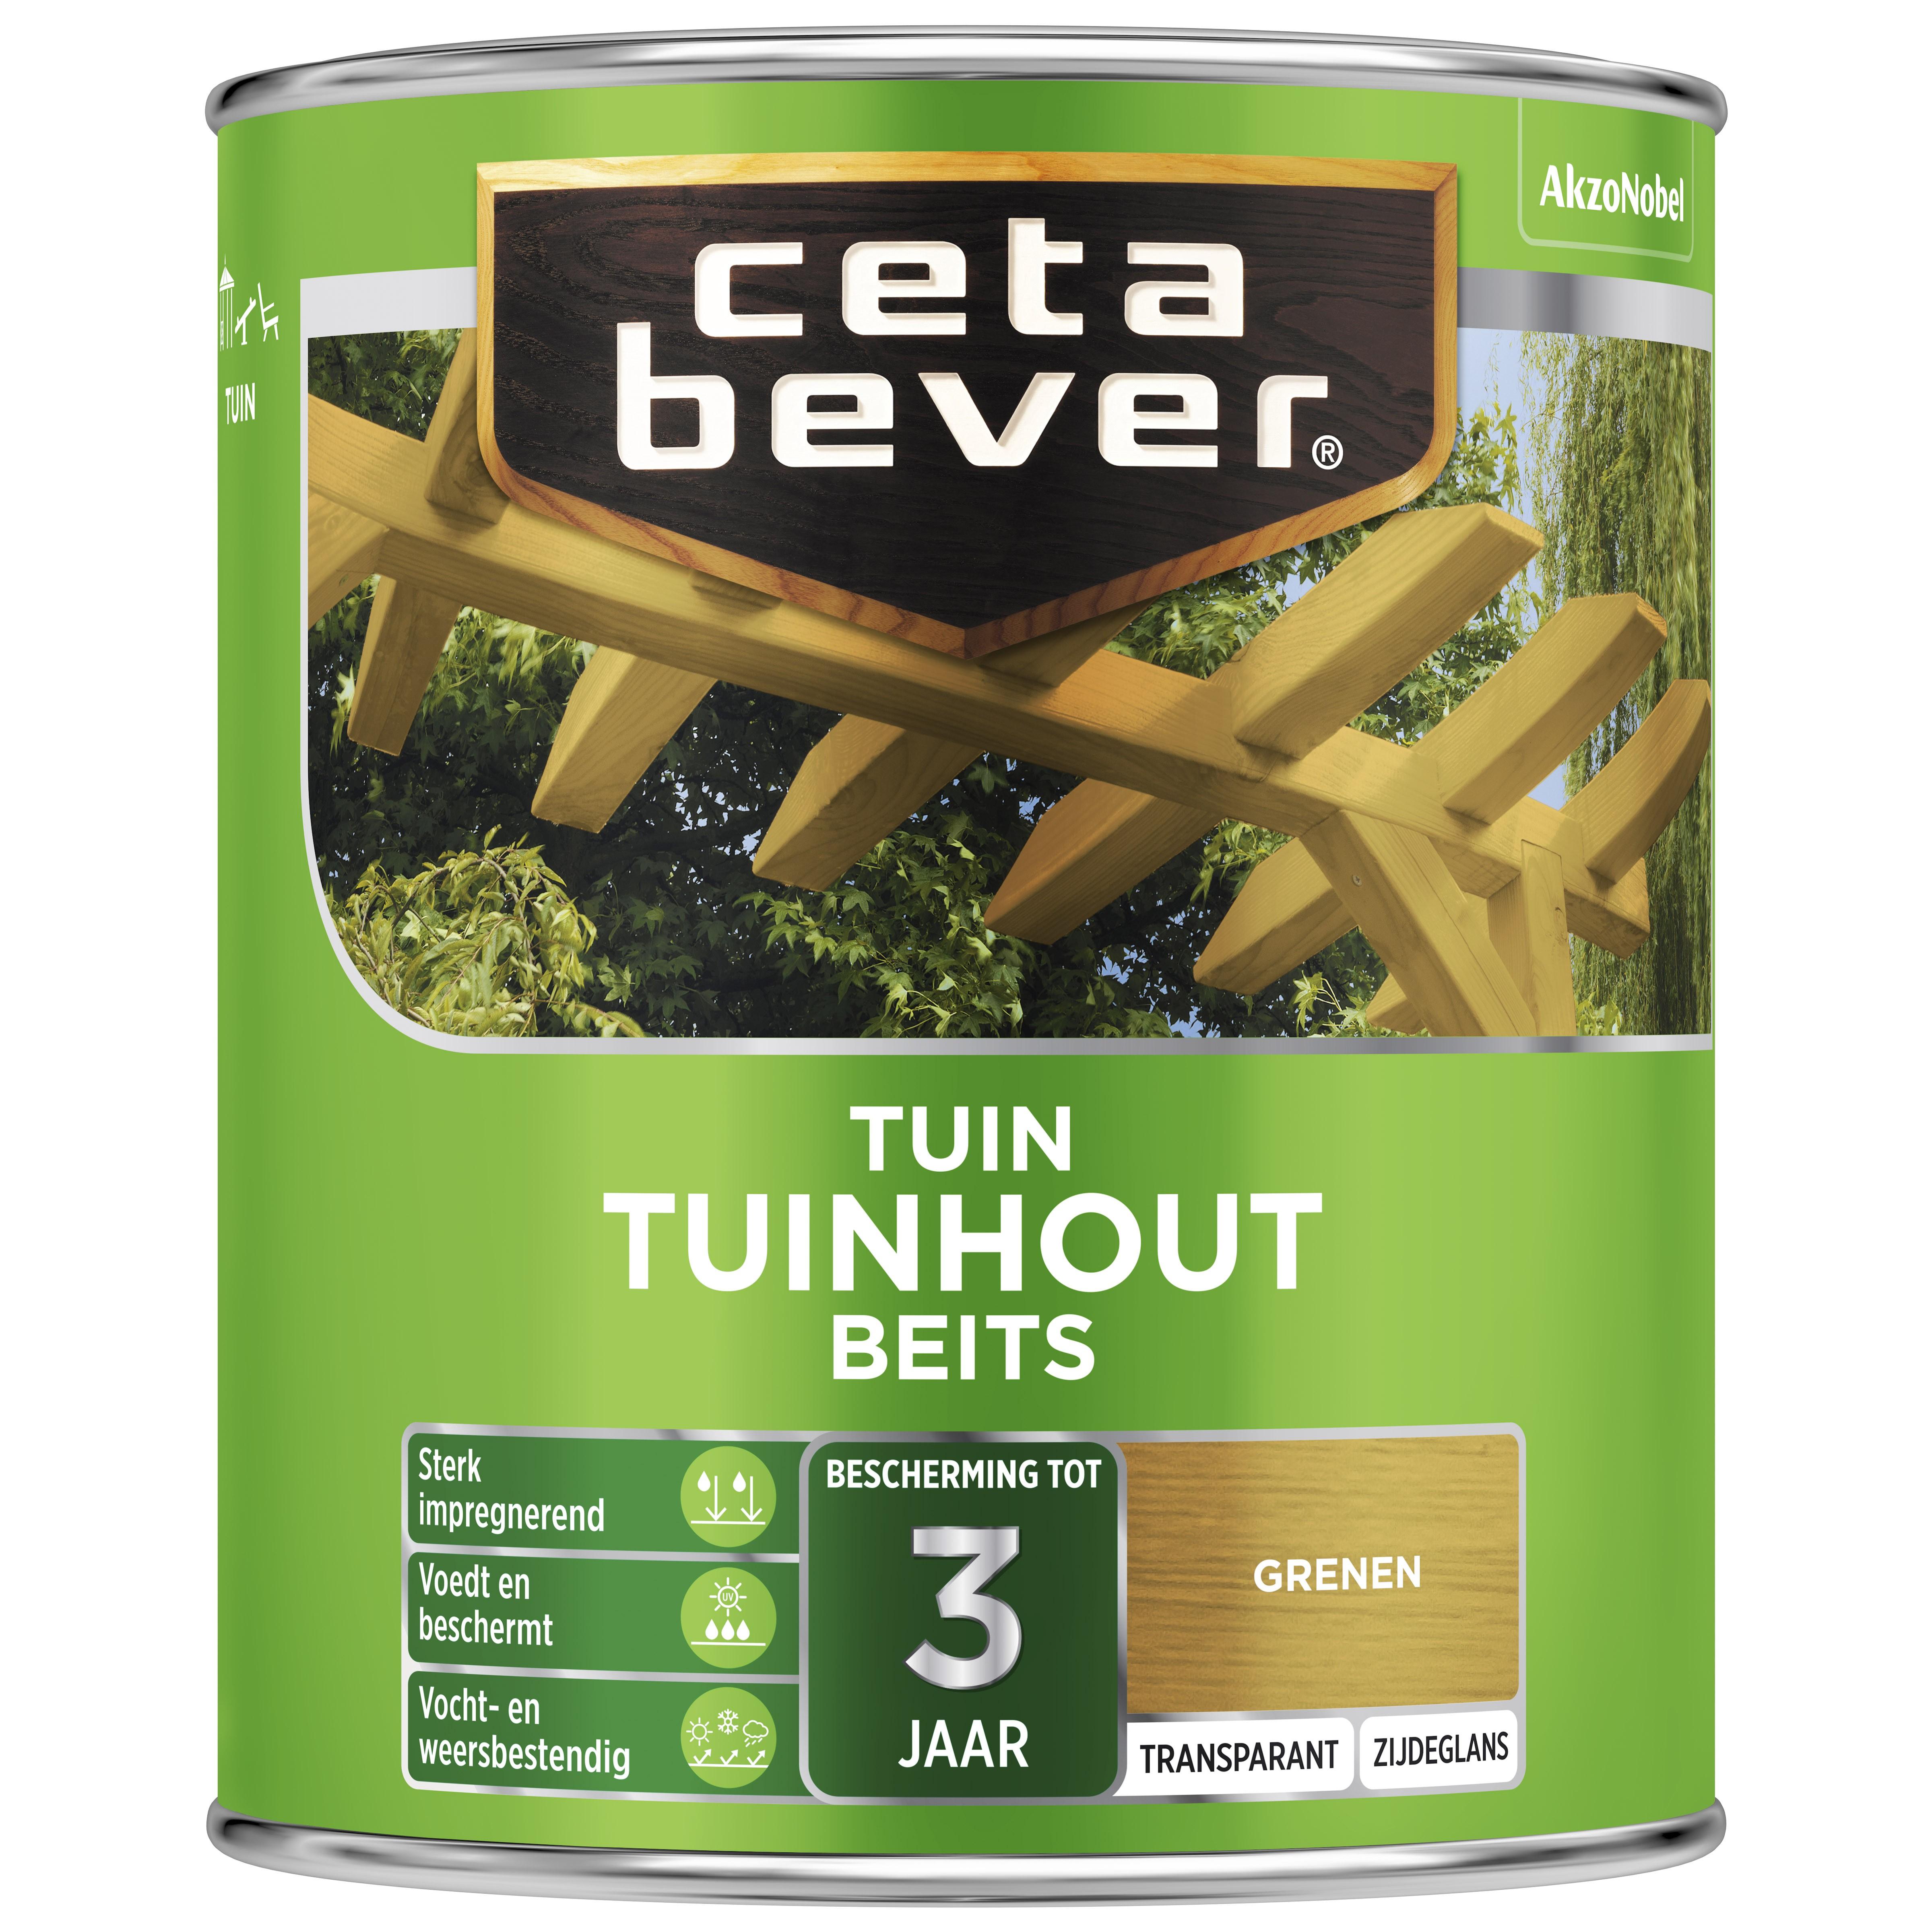 Afbeelding van CetaBever Tuinbeits Transparant 0 75 liter grenen 077